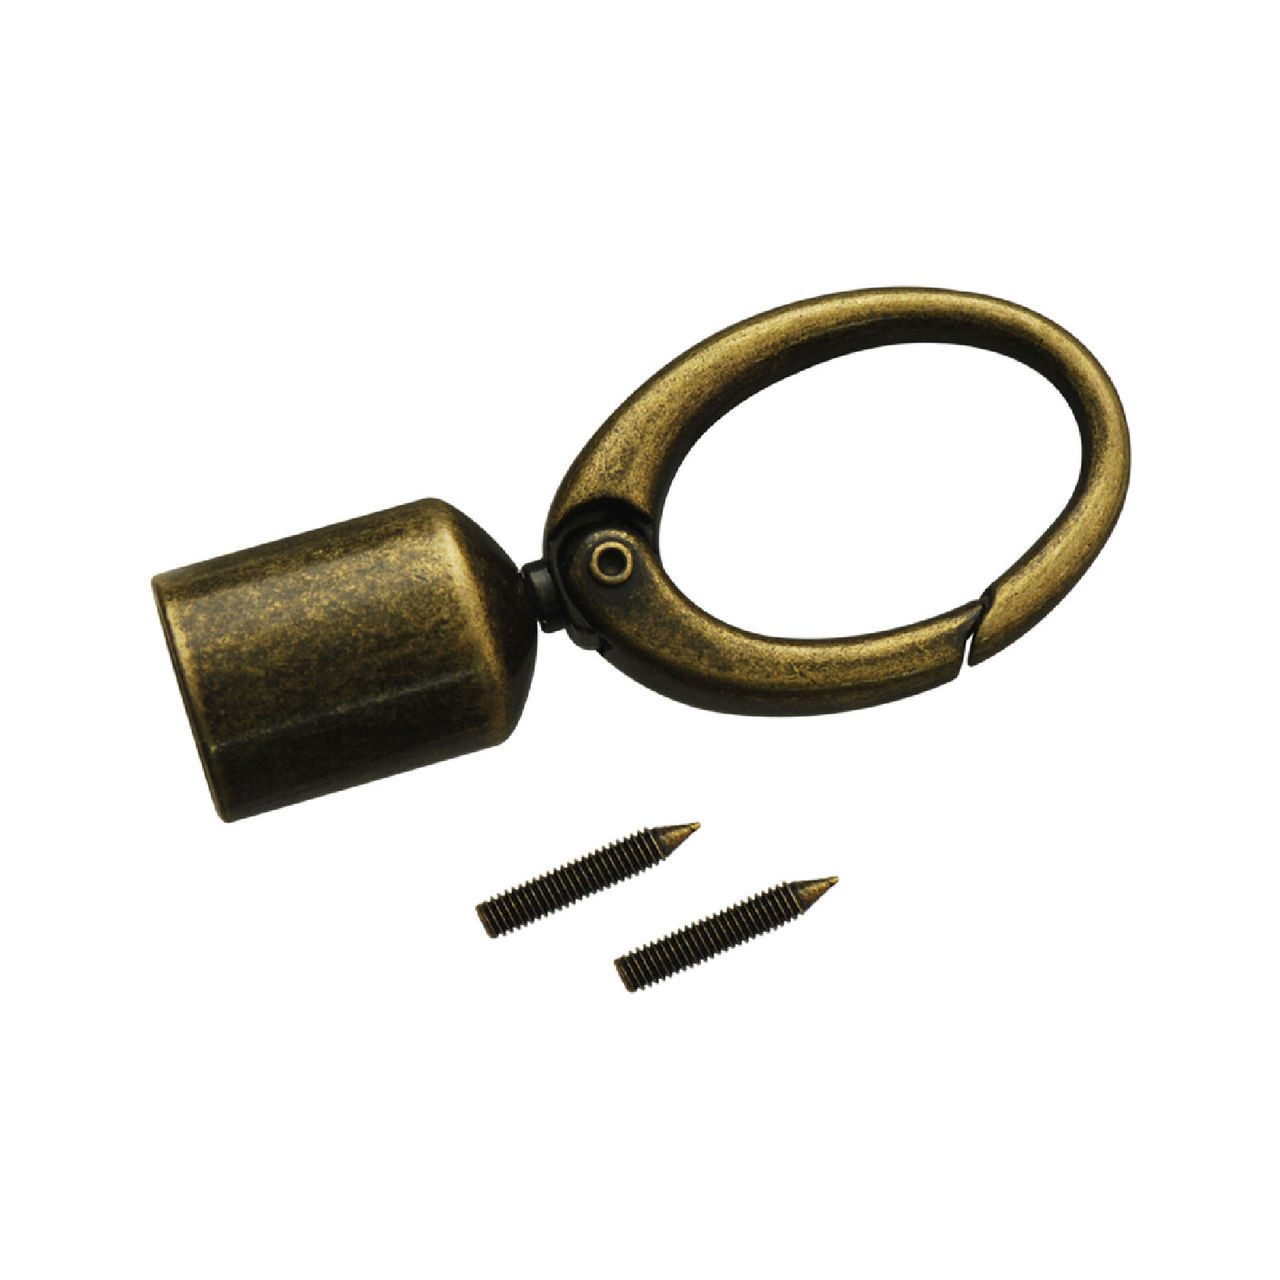 Tassel Hook Antique Brass